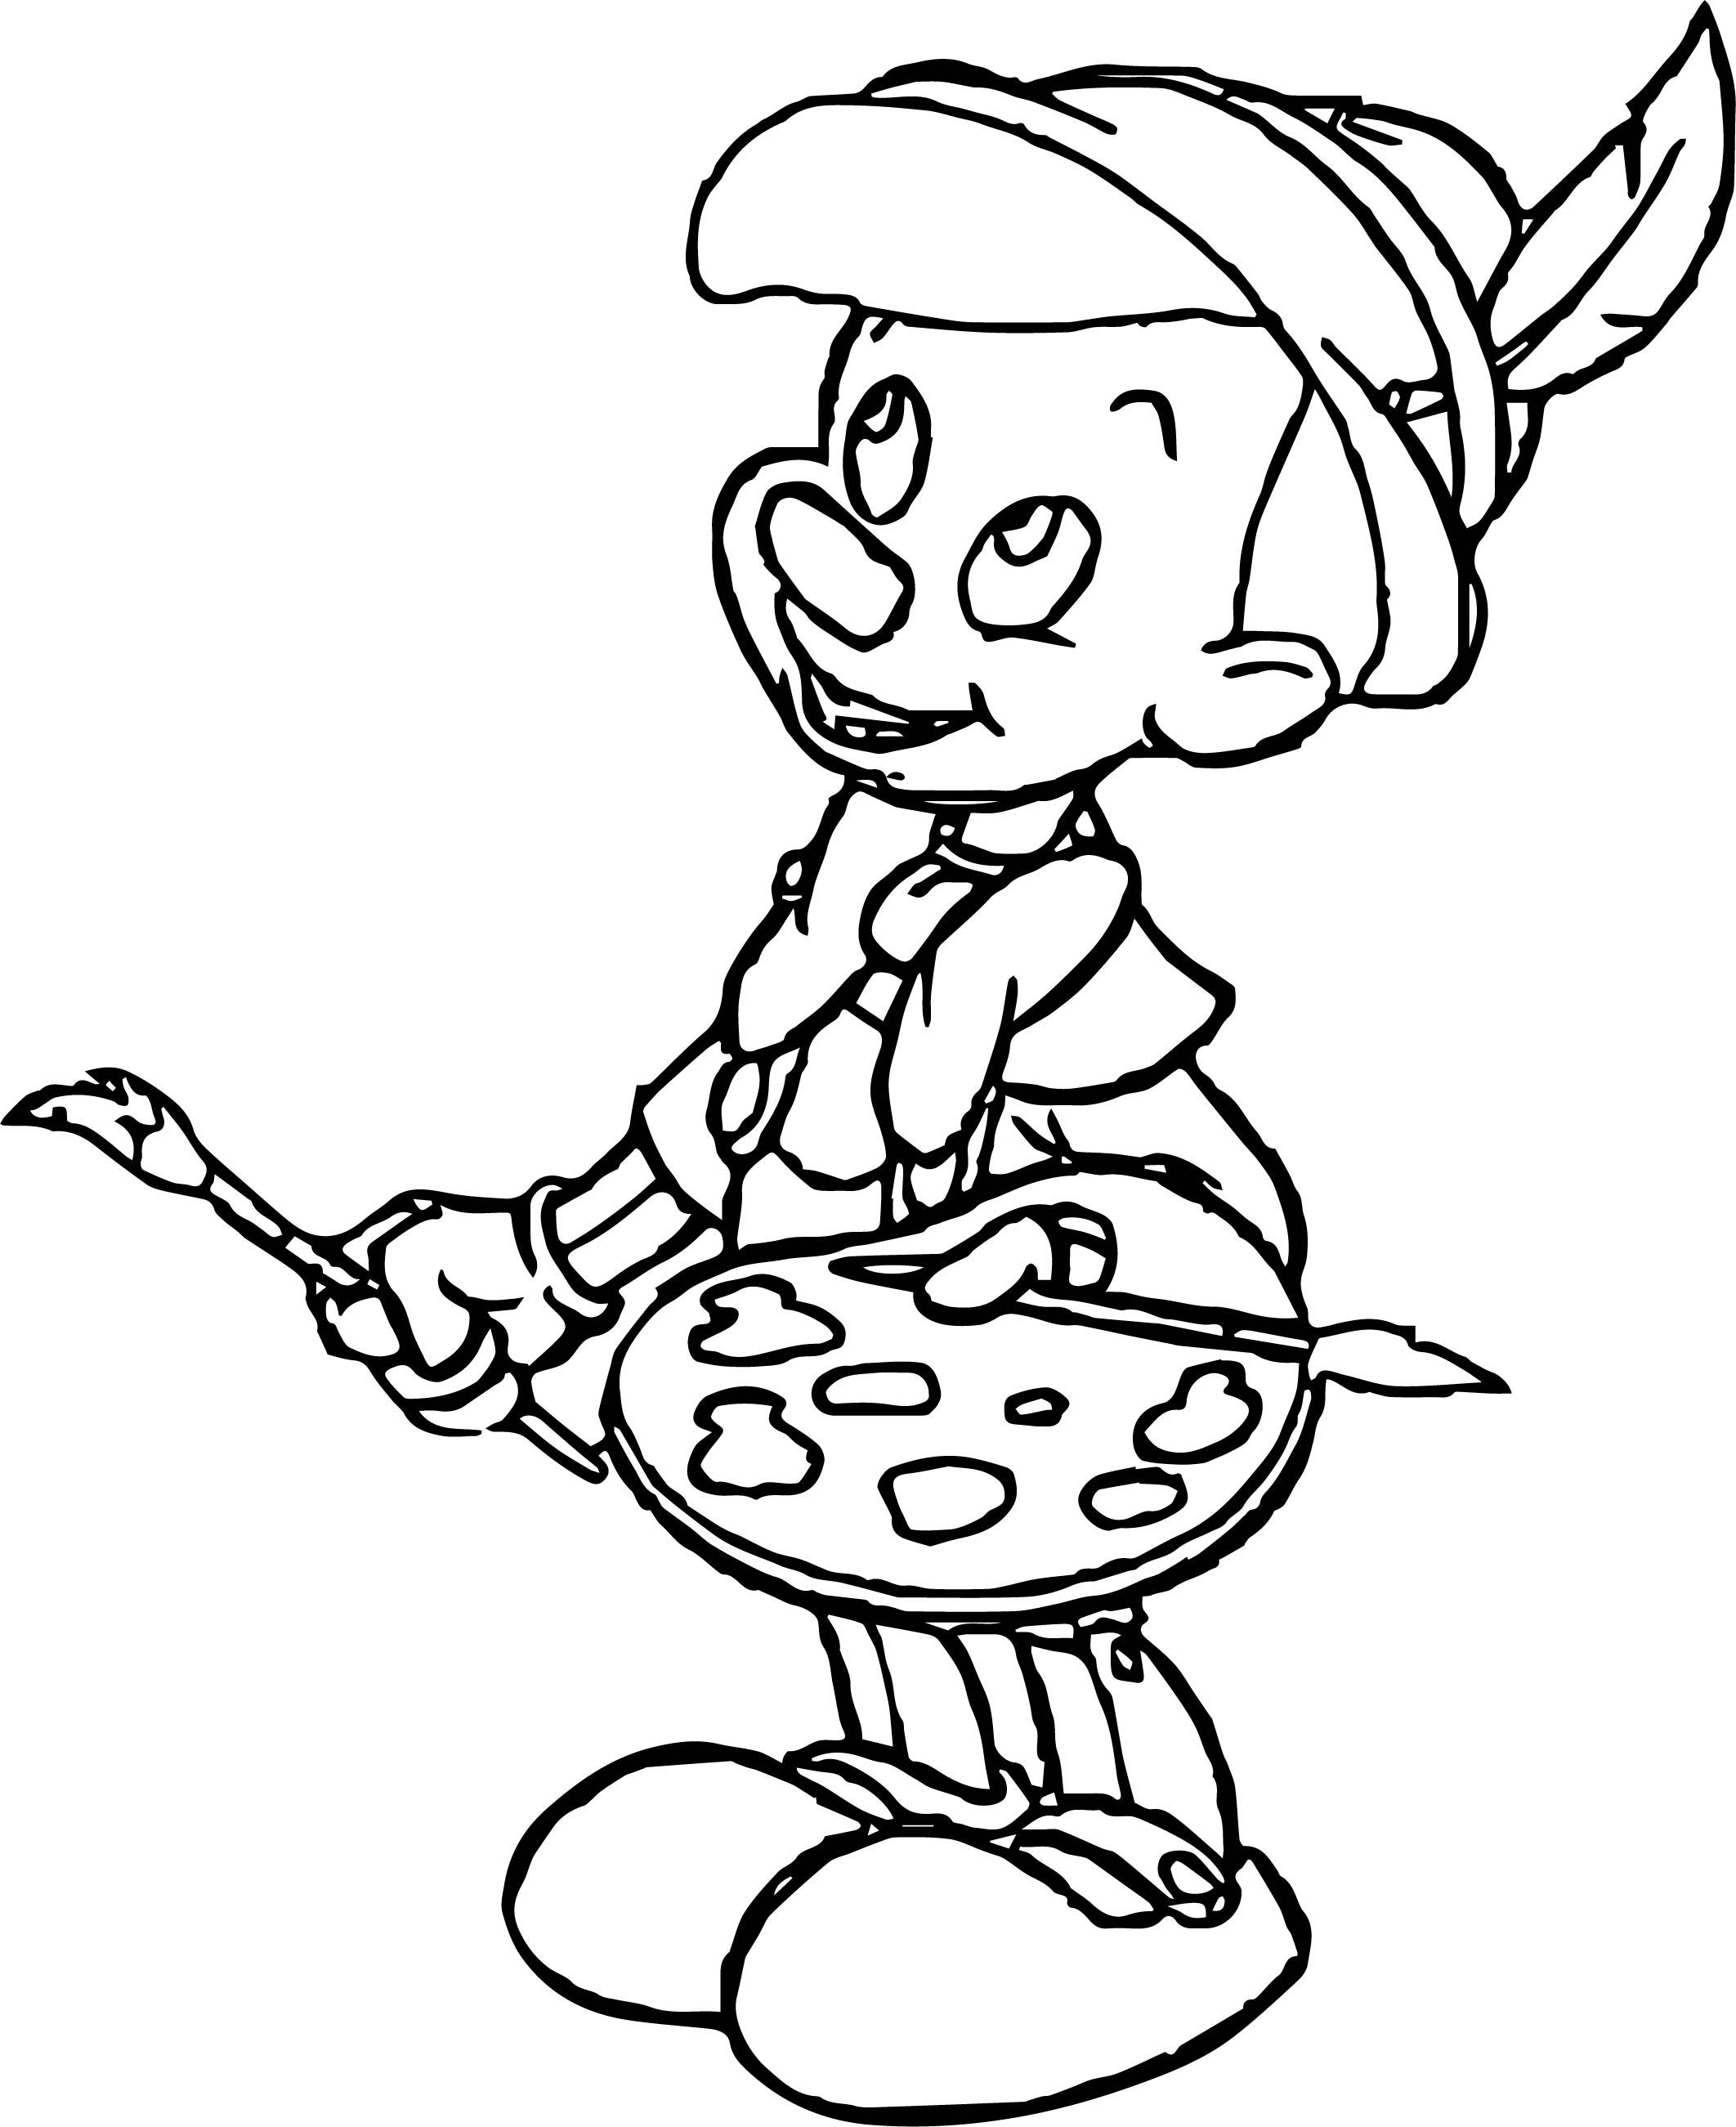 Pinocchio Paint Coloring Pages